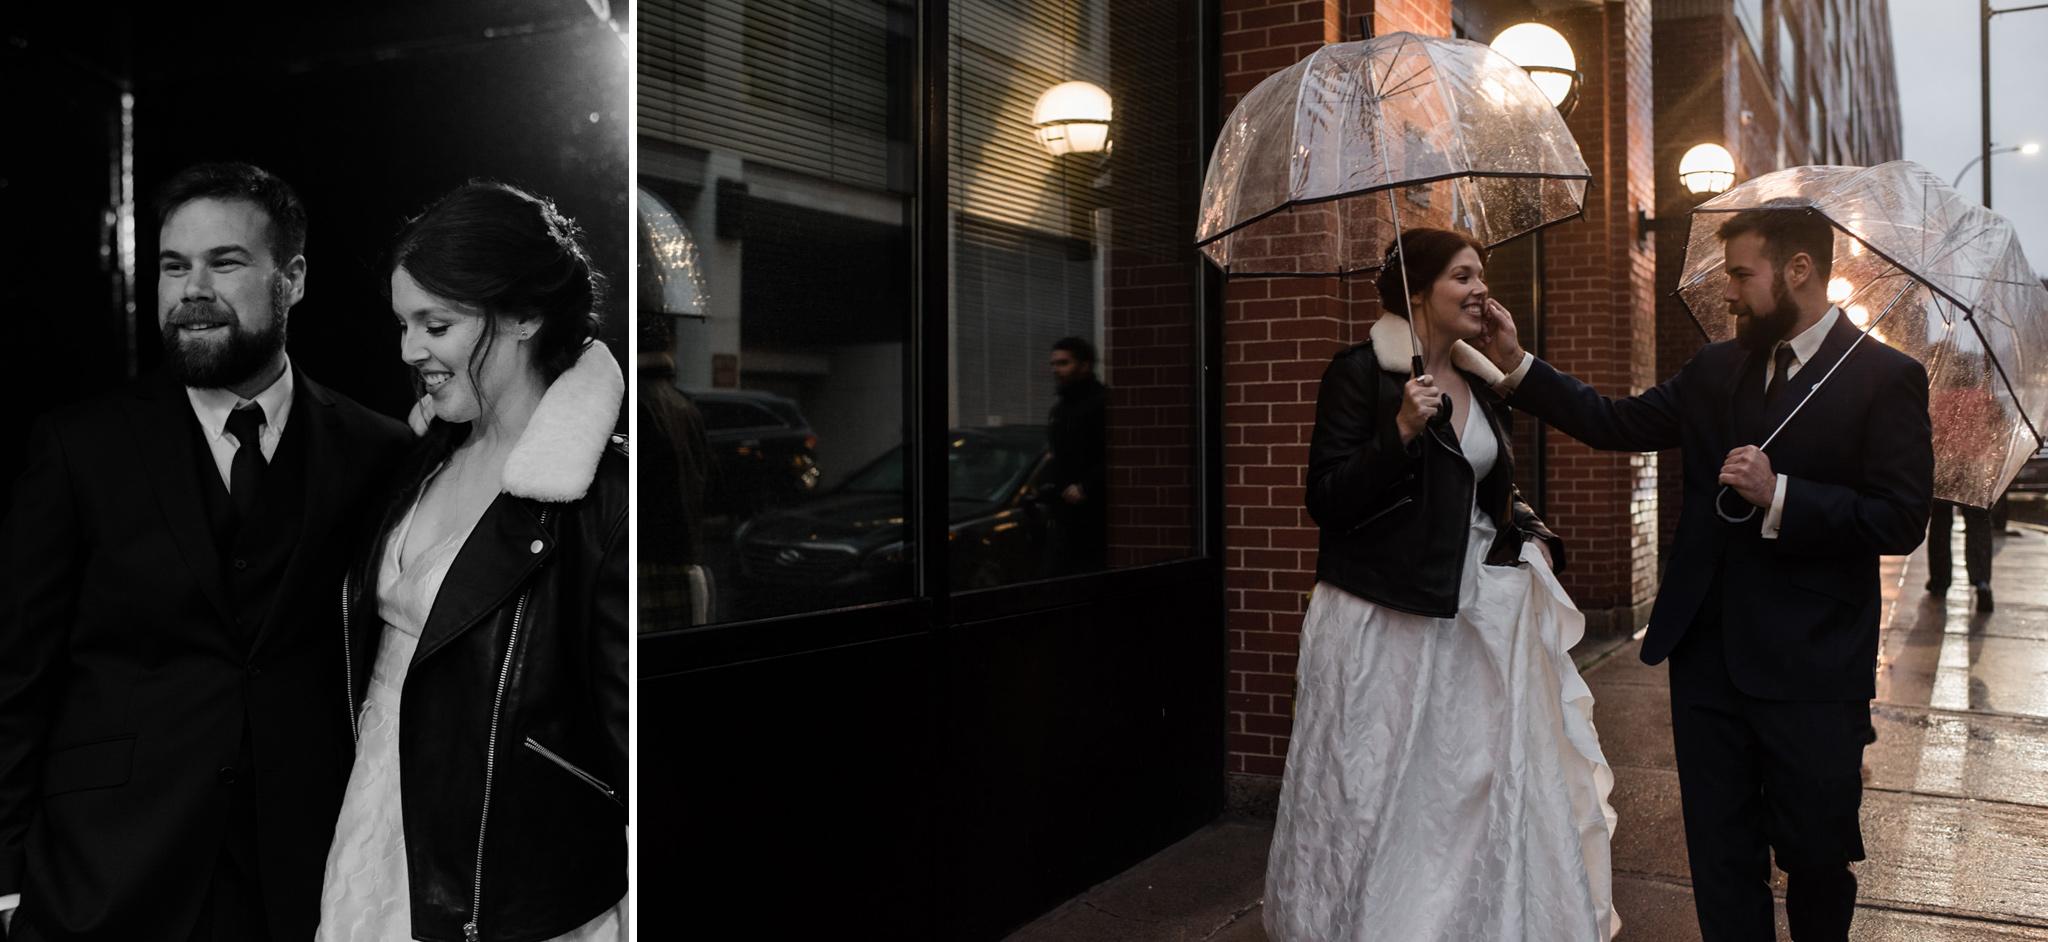 126-rainy-day-wedding-toronto-wedding-photographer-clear-umbrellas.jpg